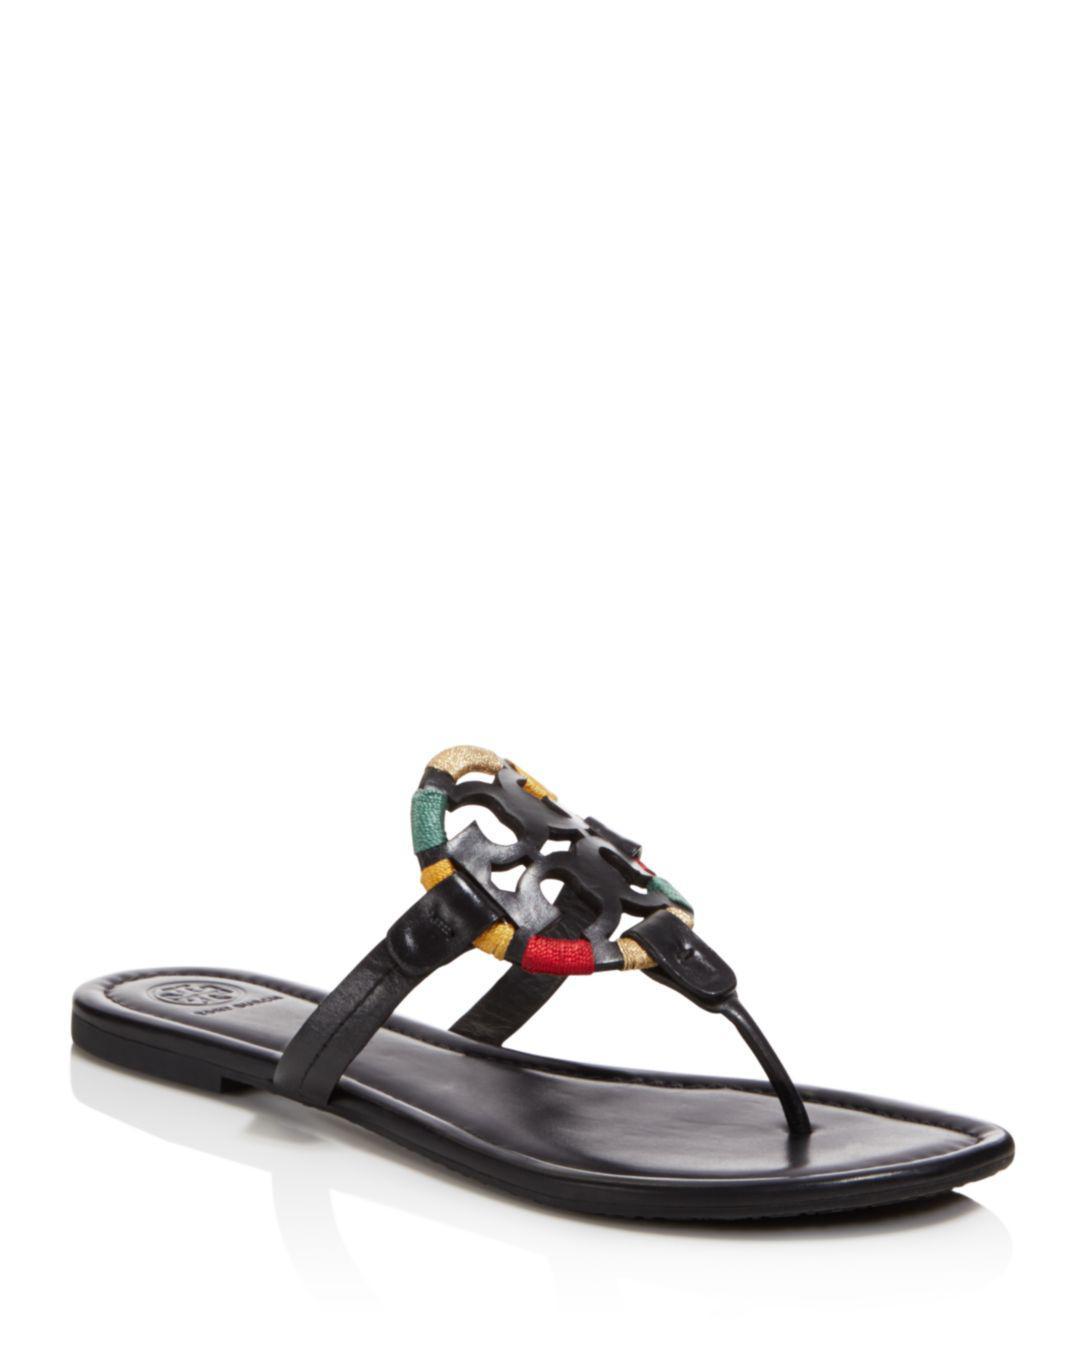 26b1769cf122 Lyst - Tory Burch Women s Miller Leather Sandals